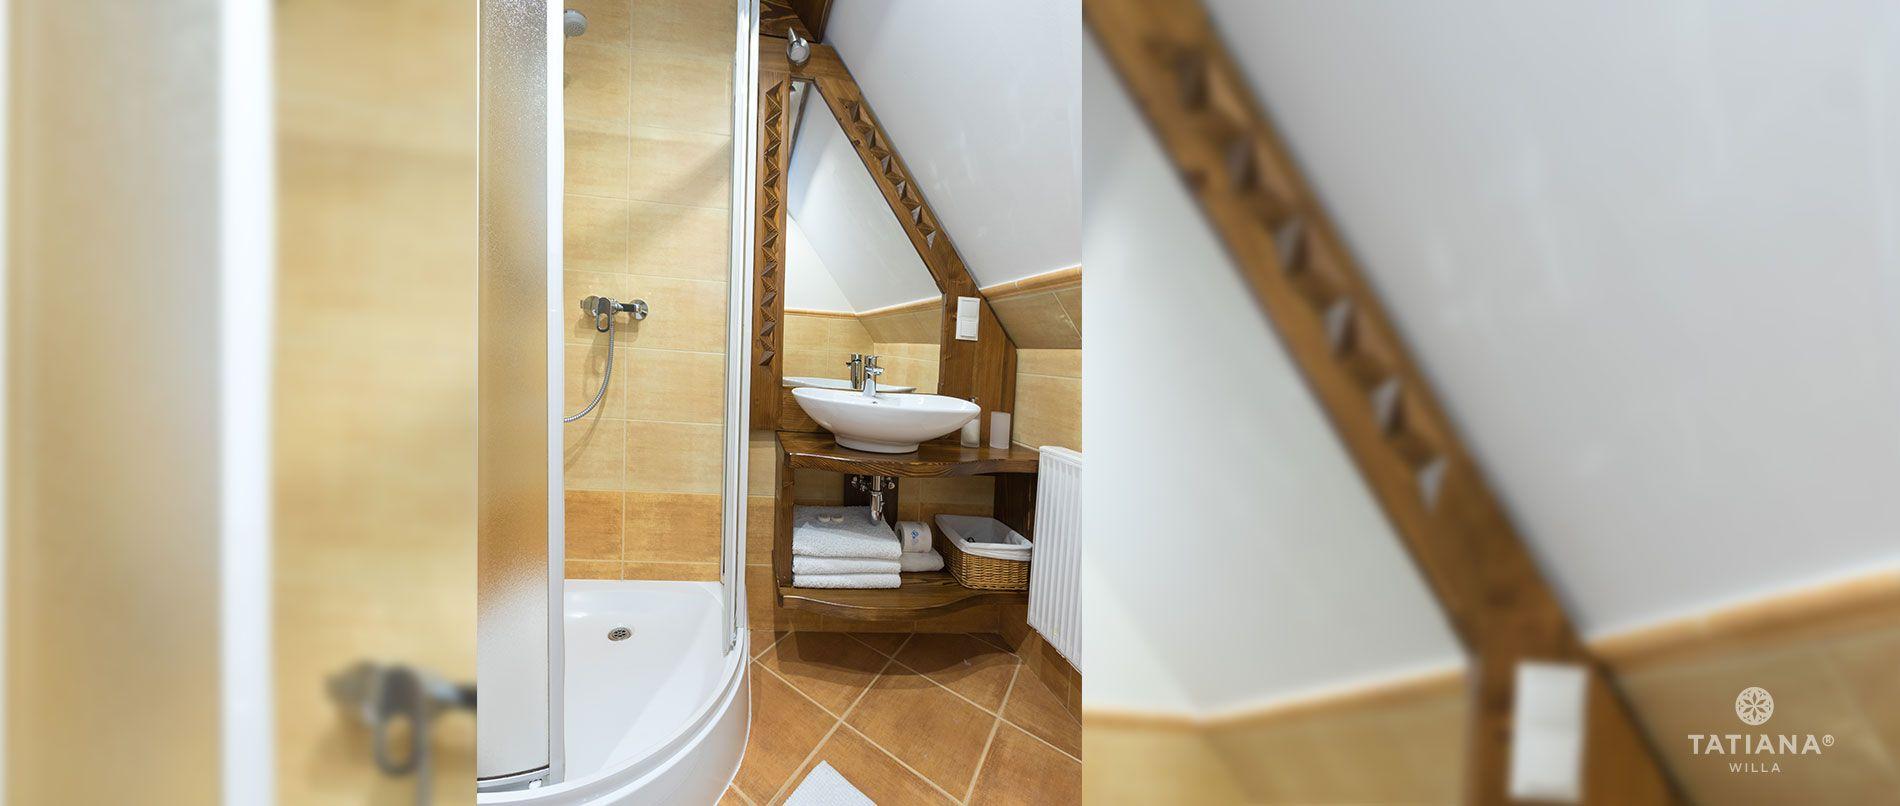 Apartament Premium 6 - łazienka